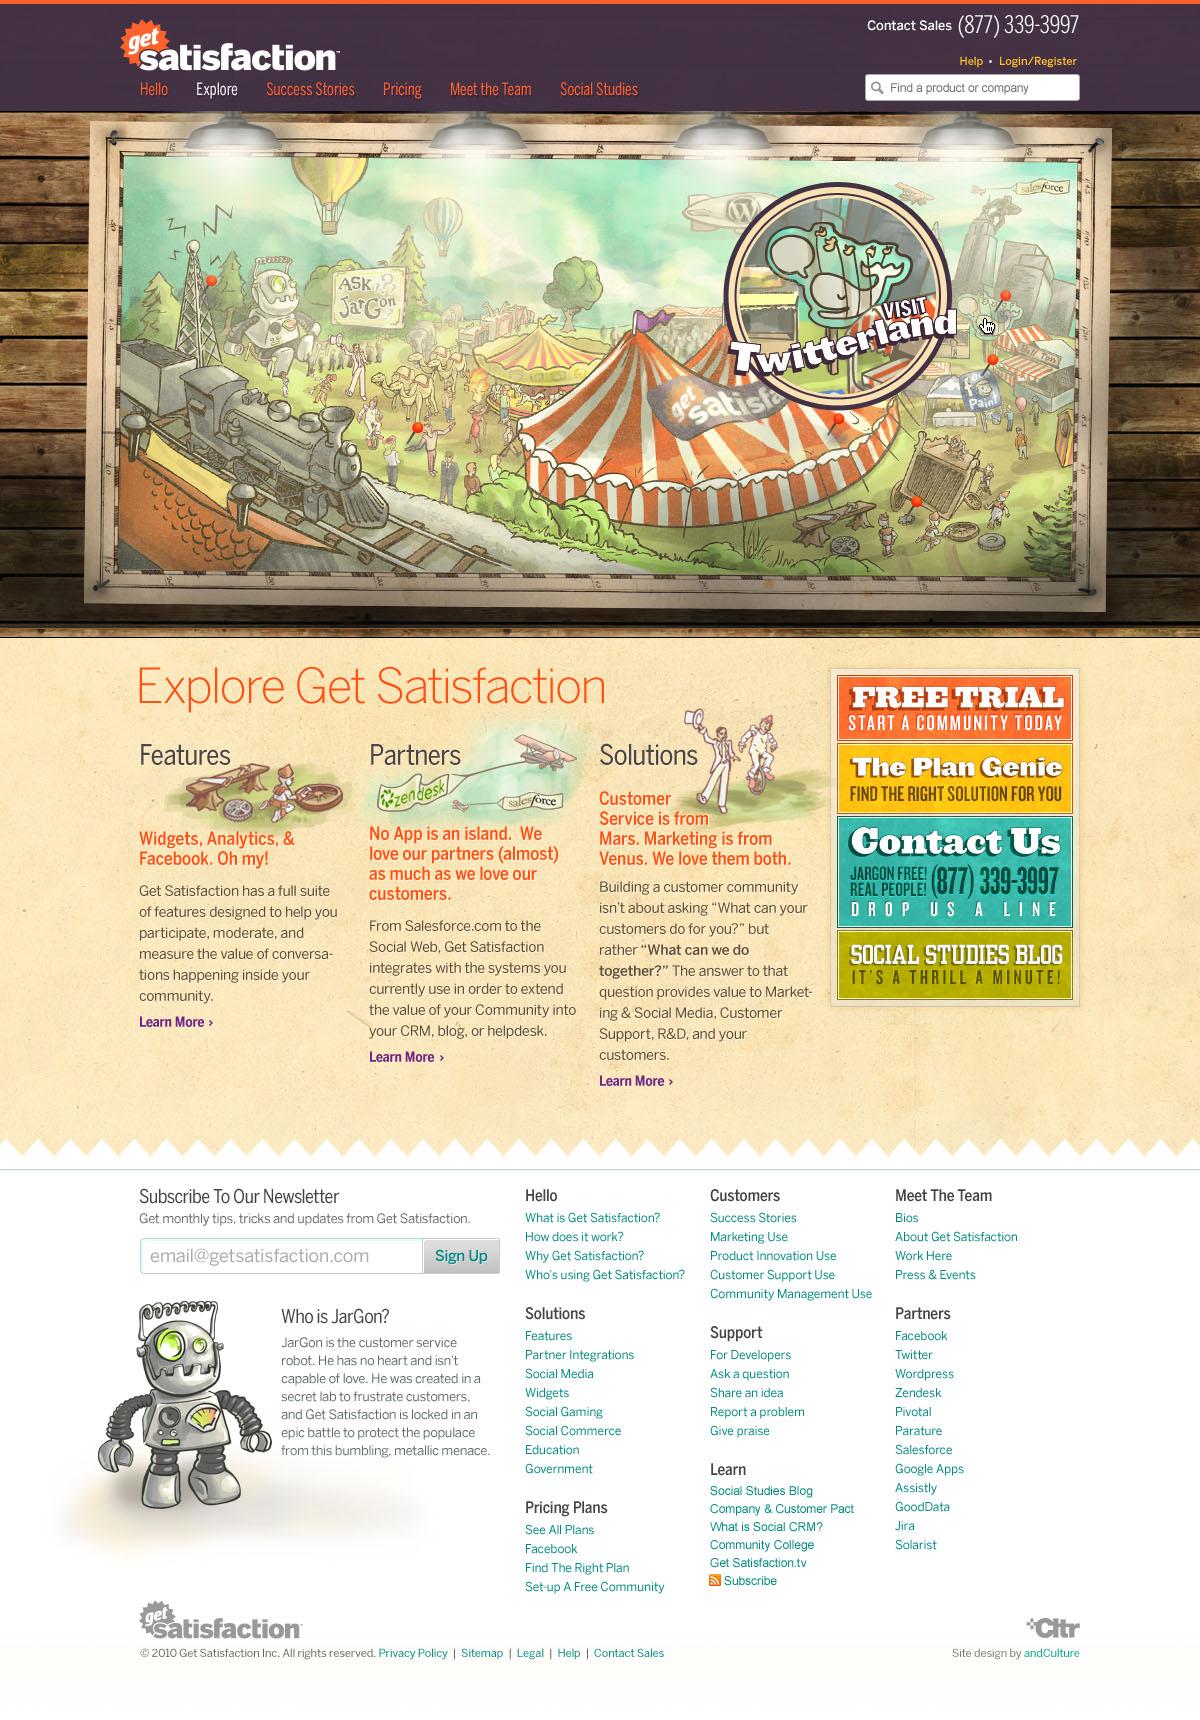 Get Satisfaction, Explore Get Satisfaction page, September 2010